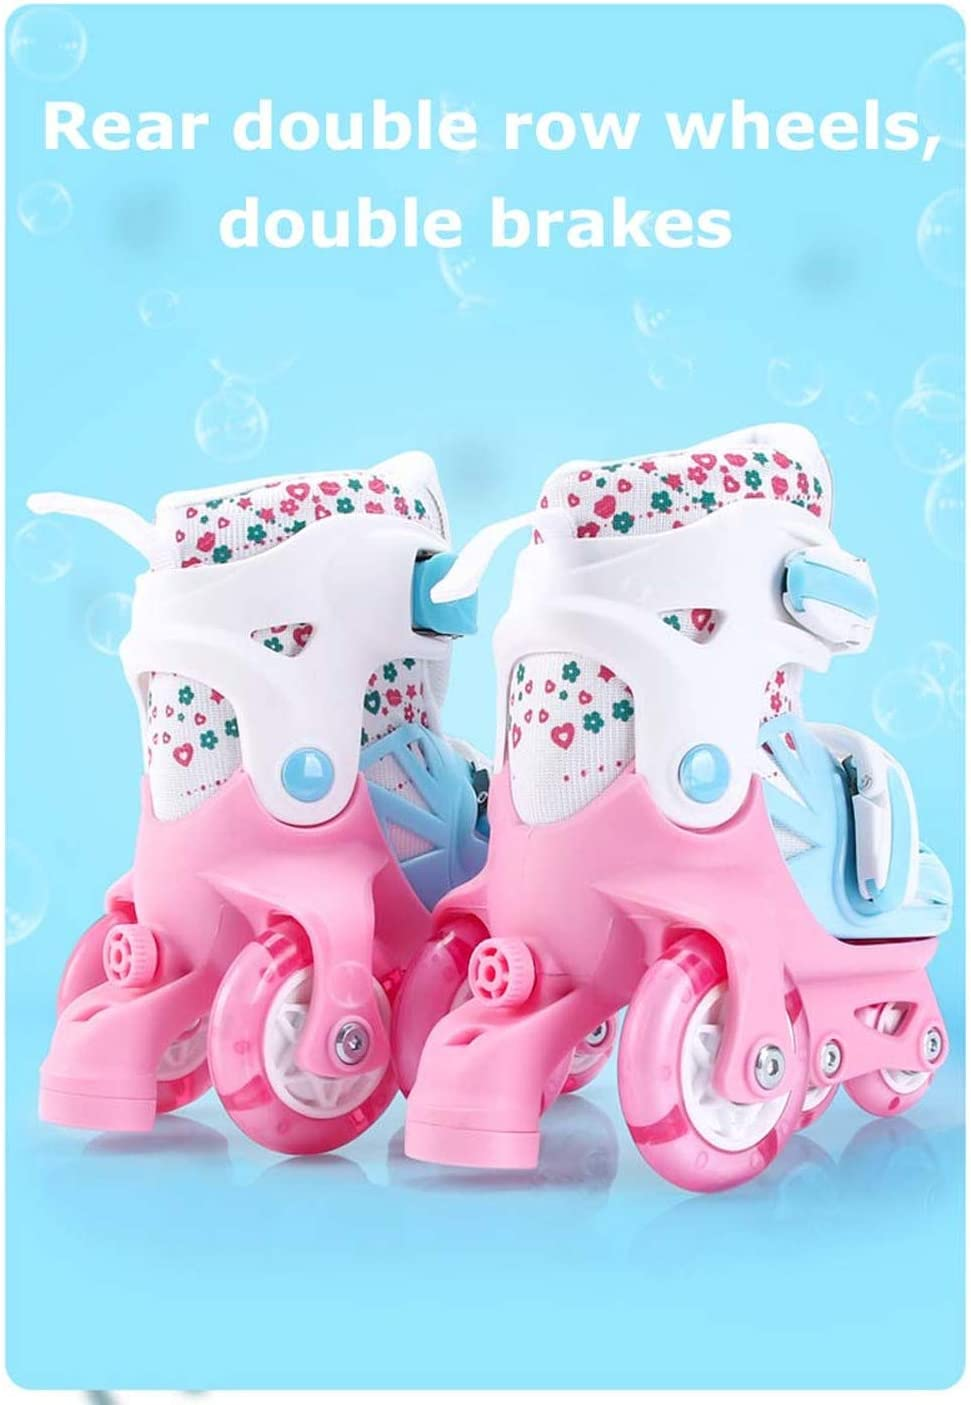 Girls Boys for Kids Size Adjustable Light Up Roller Skates 4 Wheel Double Brakes Adjustable Breathable Skating Shoes Beginners Roller Skates